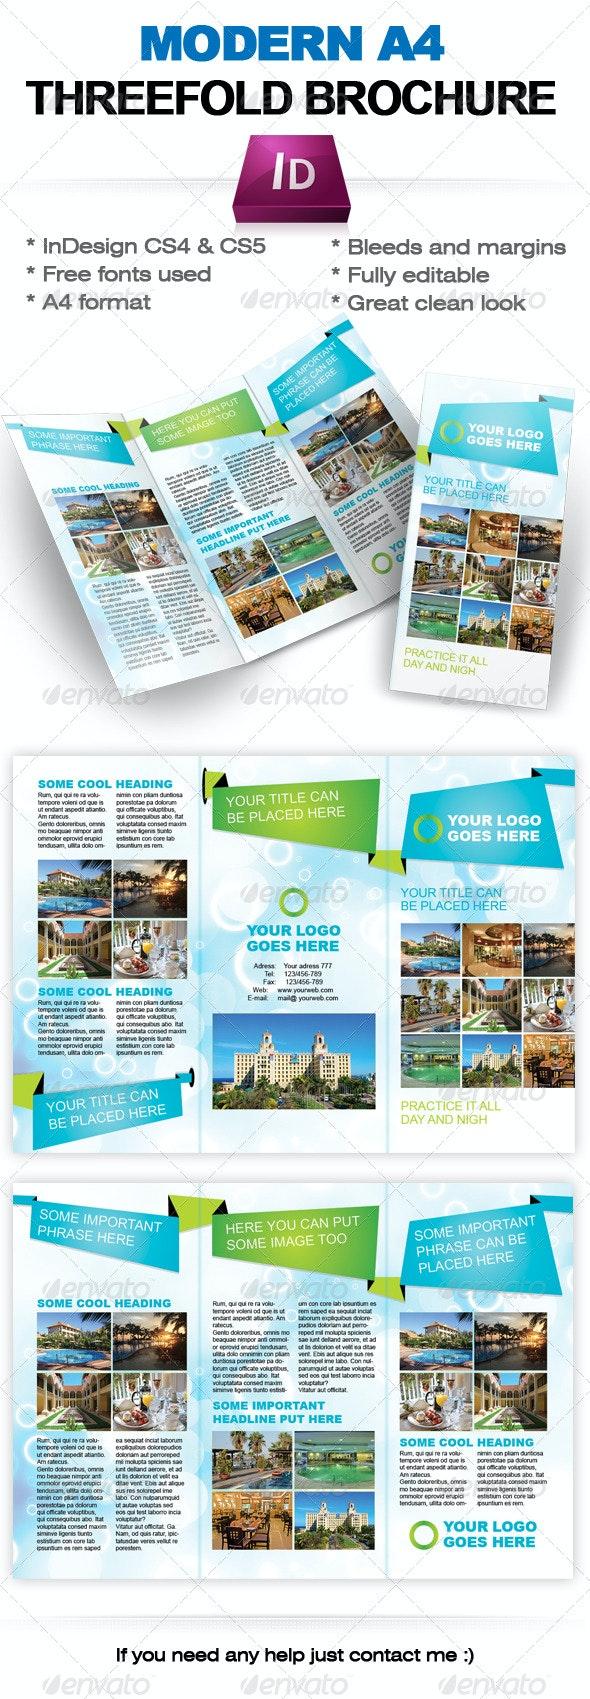 Modern Threefold Brochure InDesign template - Corporate Brochures